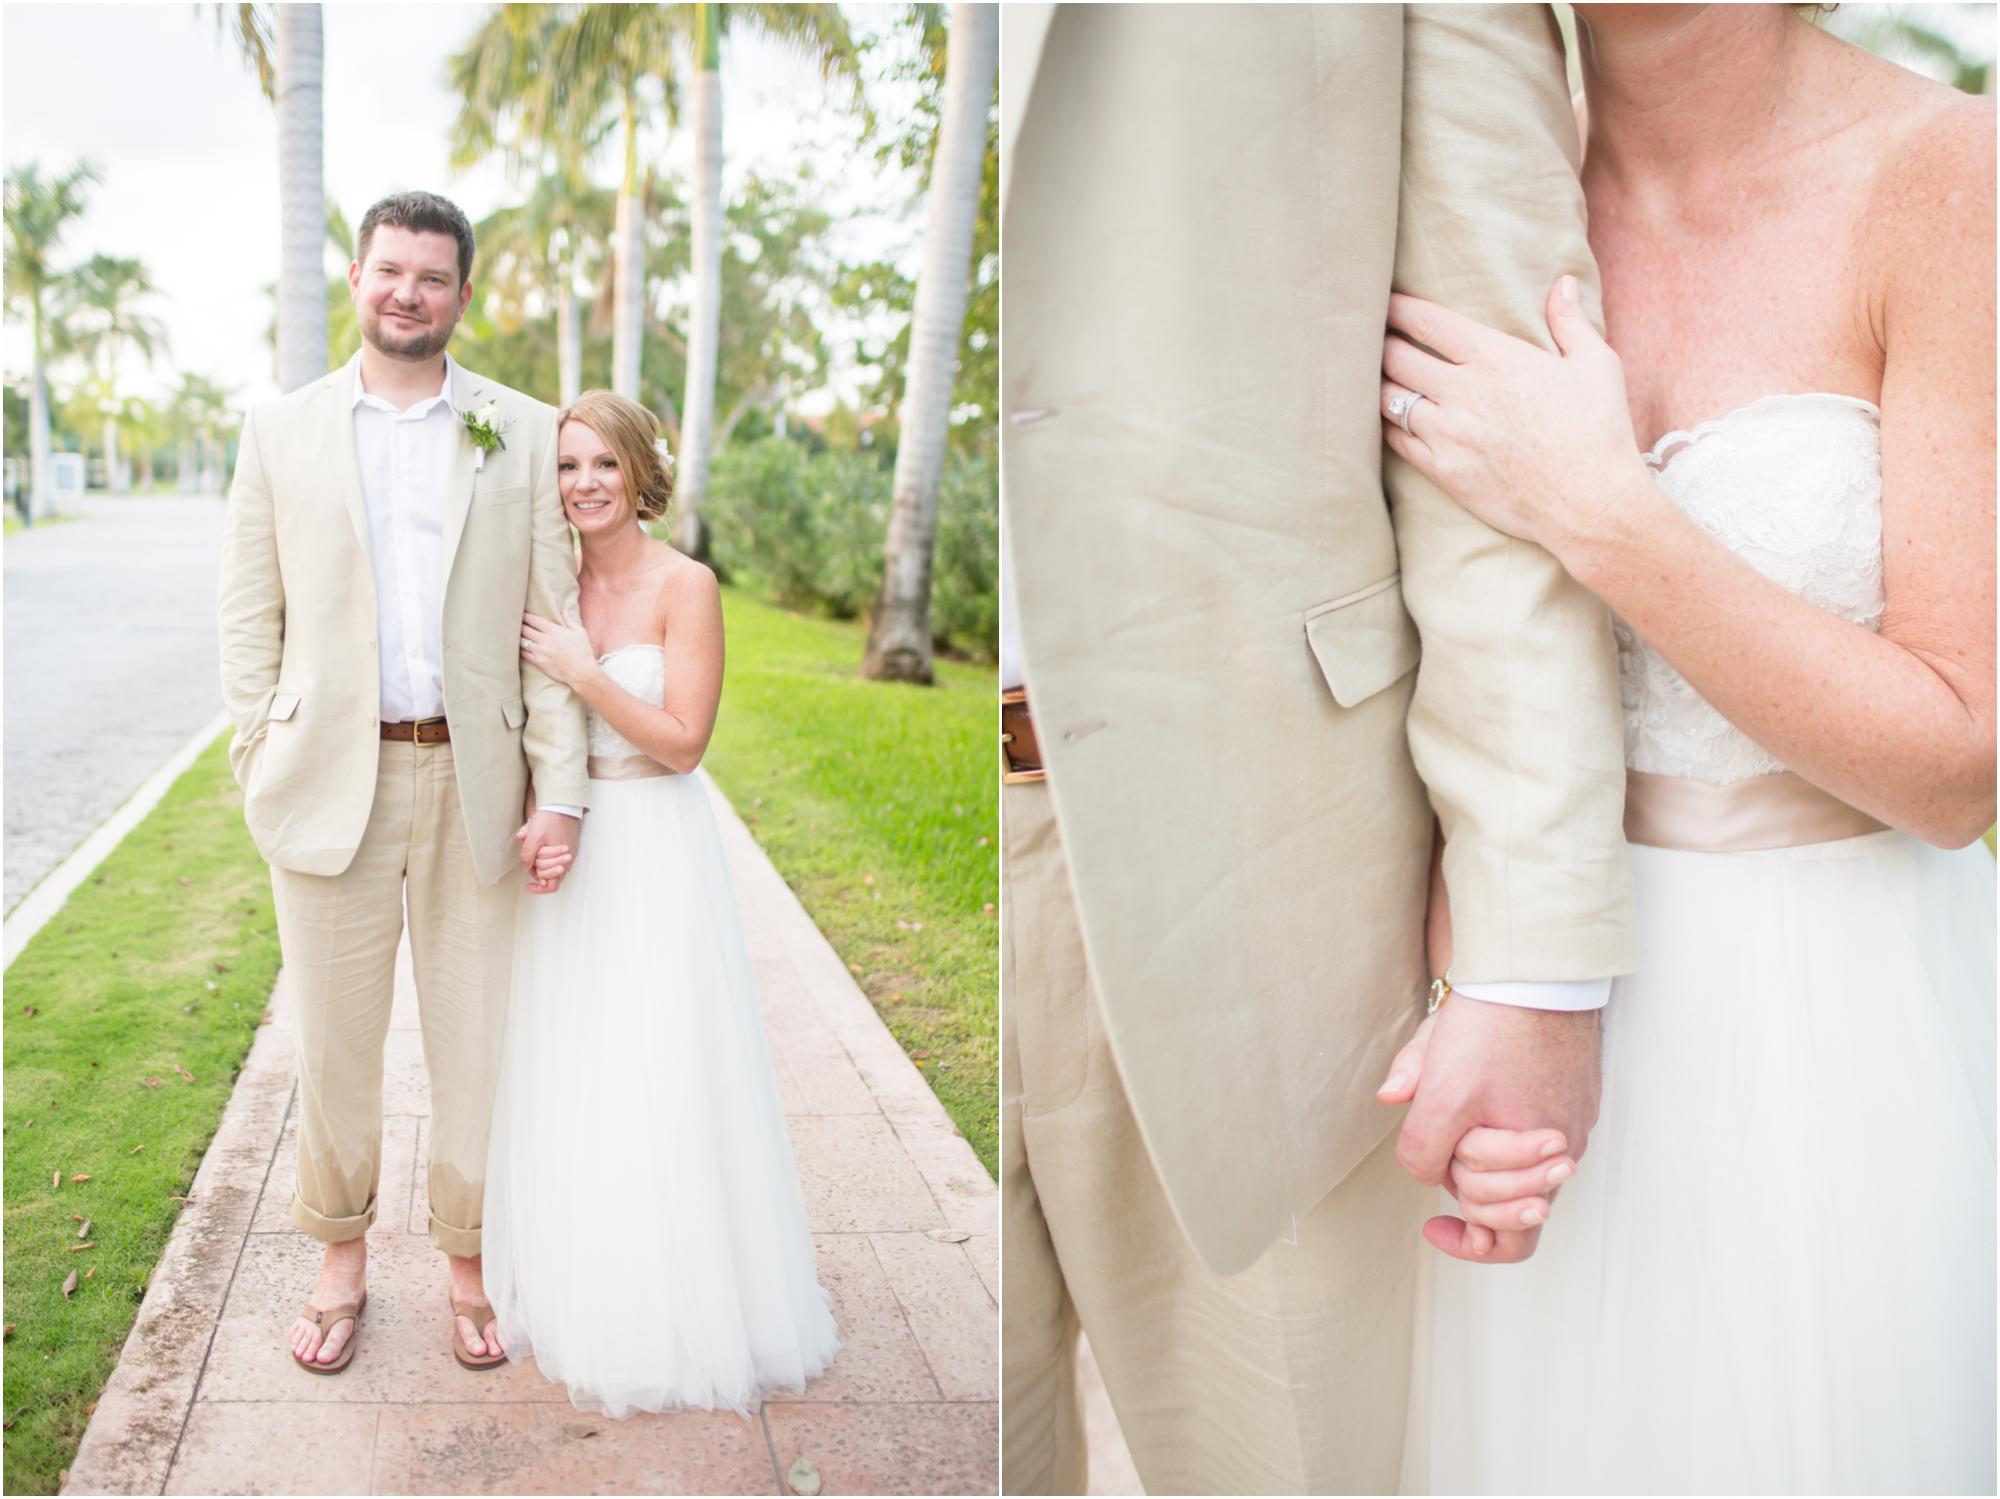 Morosoff Wedding 4-Bride & Groom Portraits-536_anna grace photography destination wedding photographer playa del carmen mexico photo.jpg